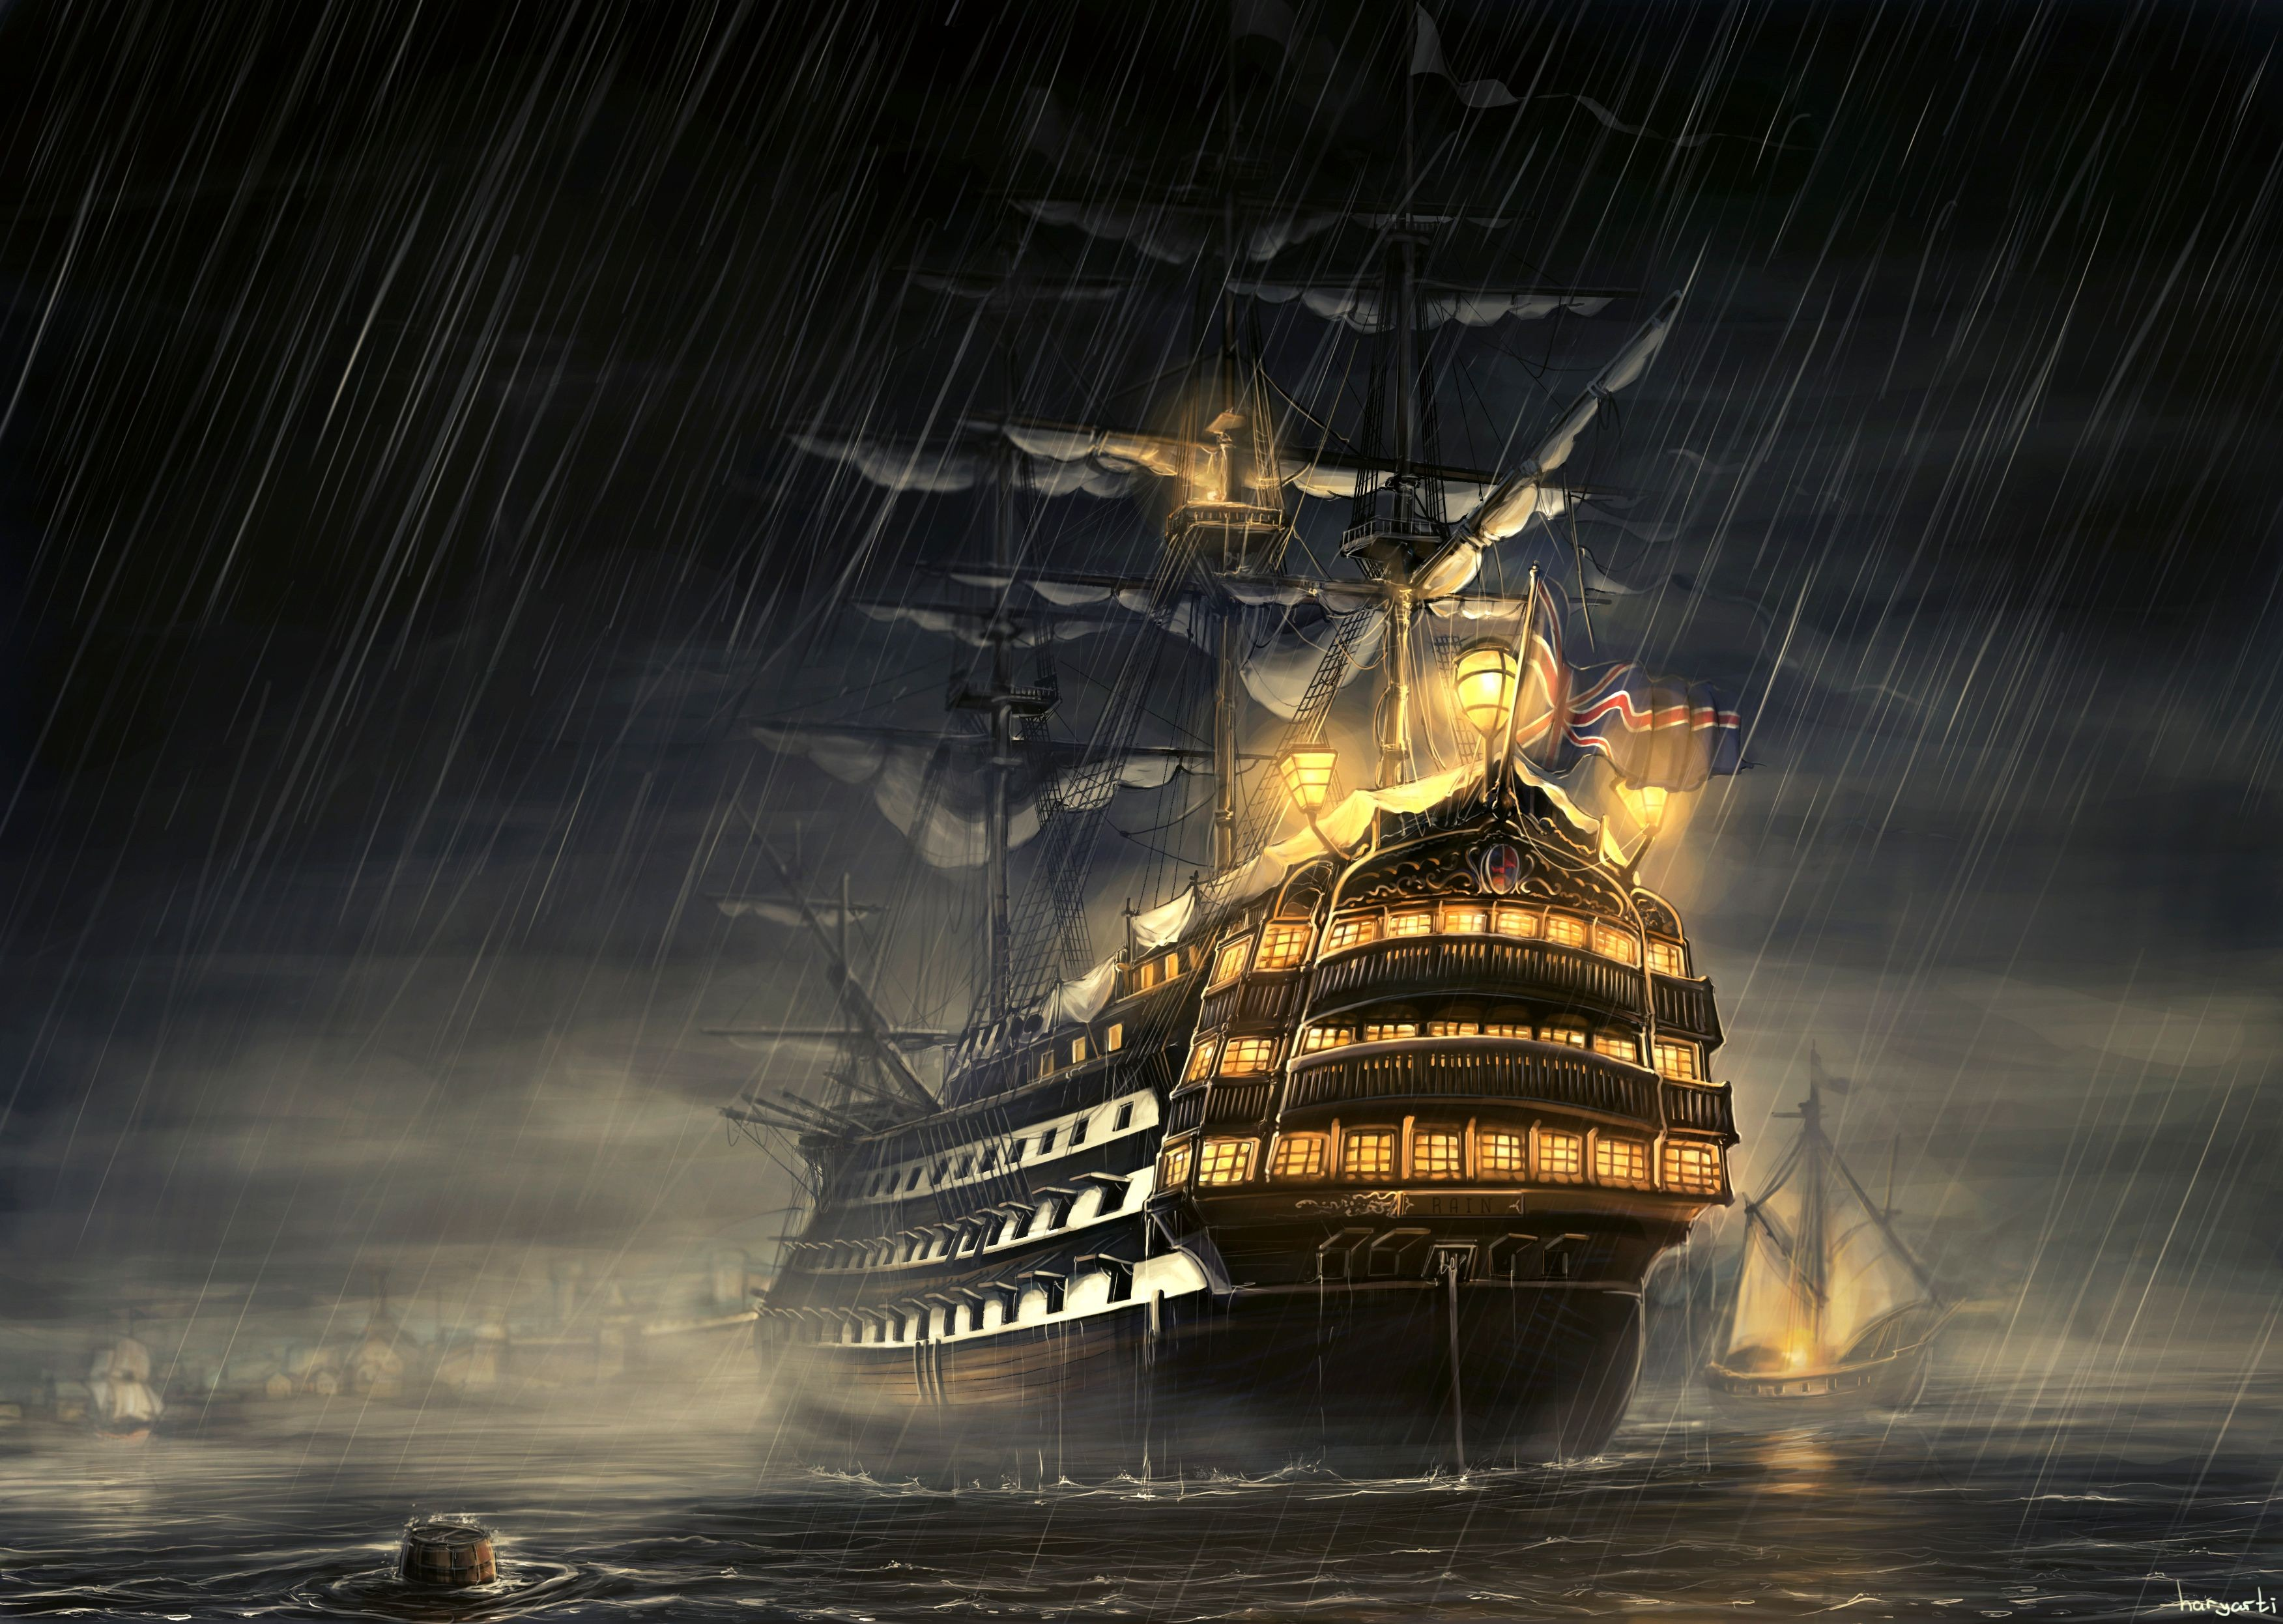 Ship HD Wallpaper | Background Image | 3504x2493 | ID ...